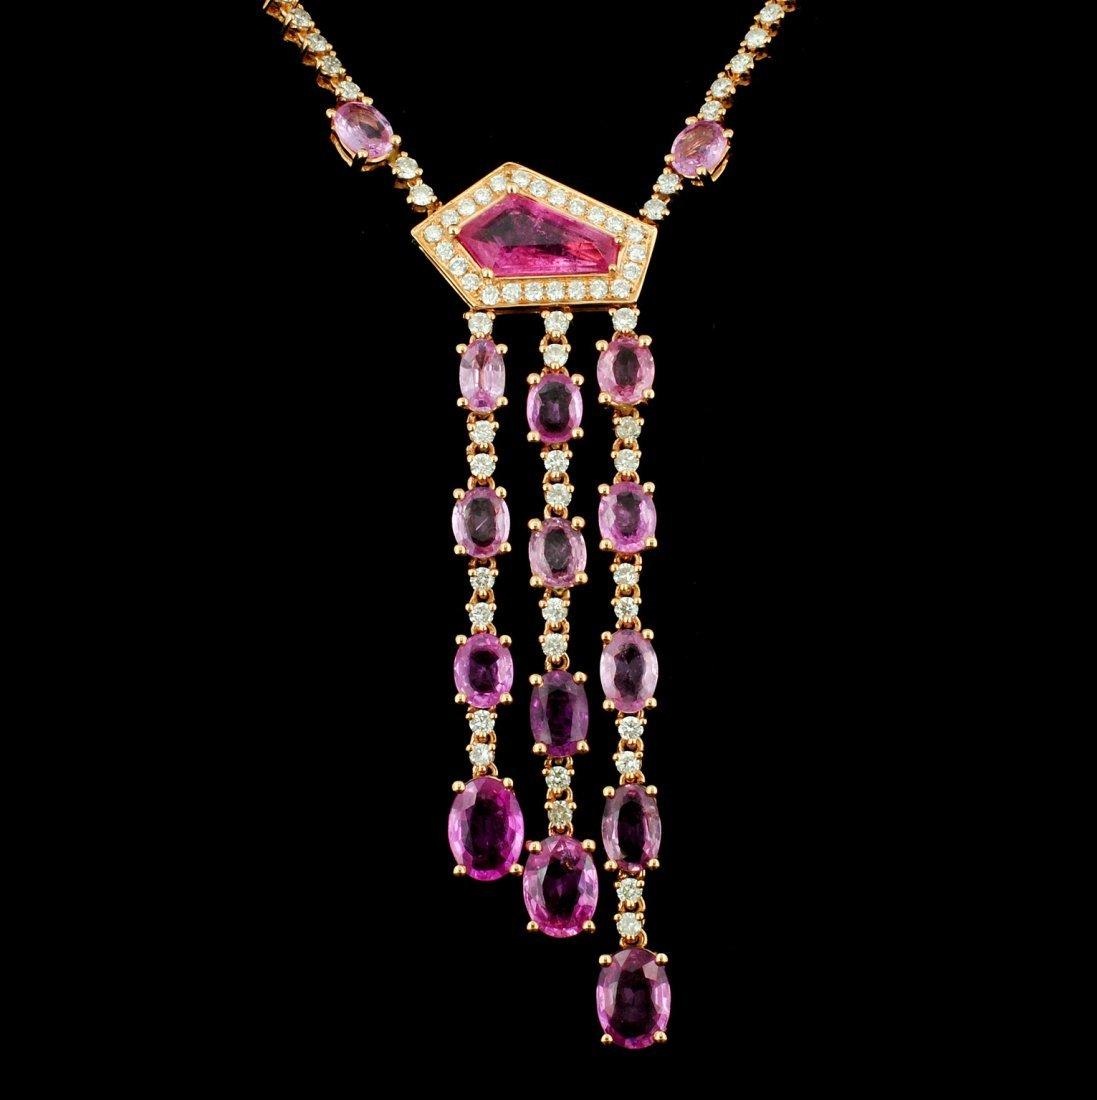 18K Gold 9.09ct Sapphire & 2.56ct Diamond Necklace